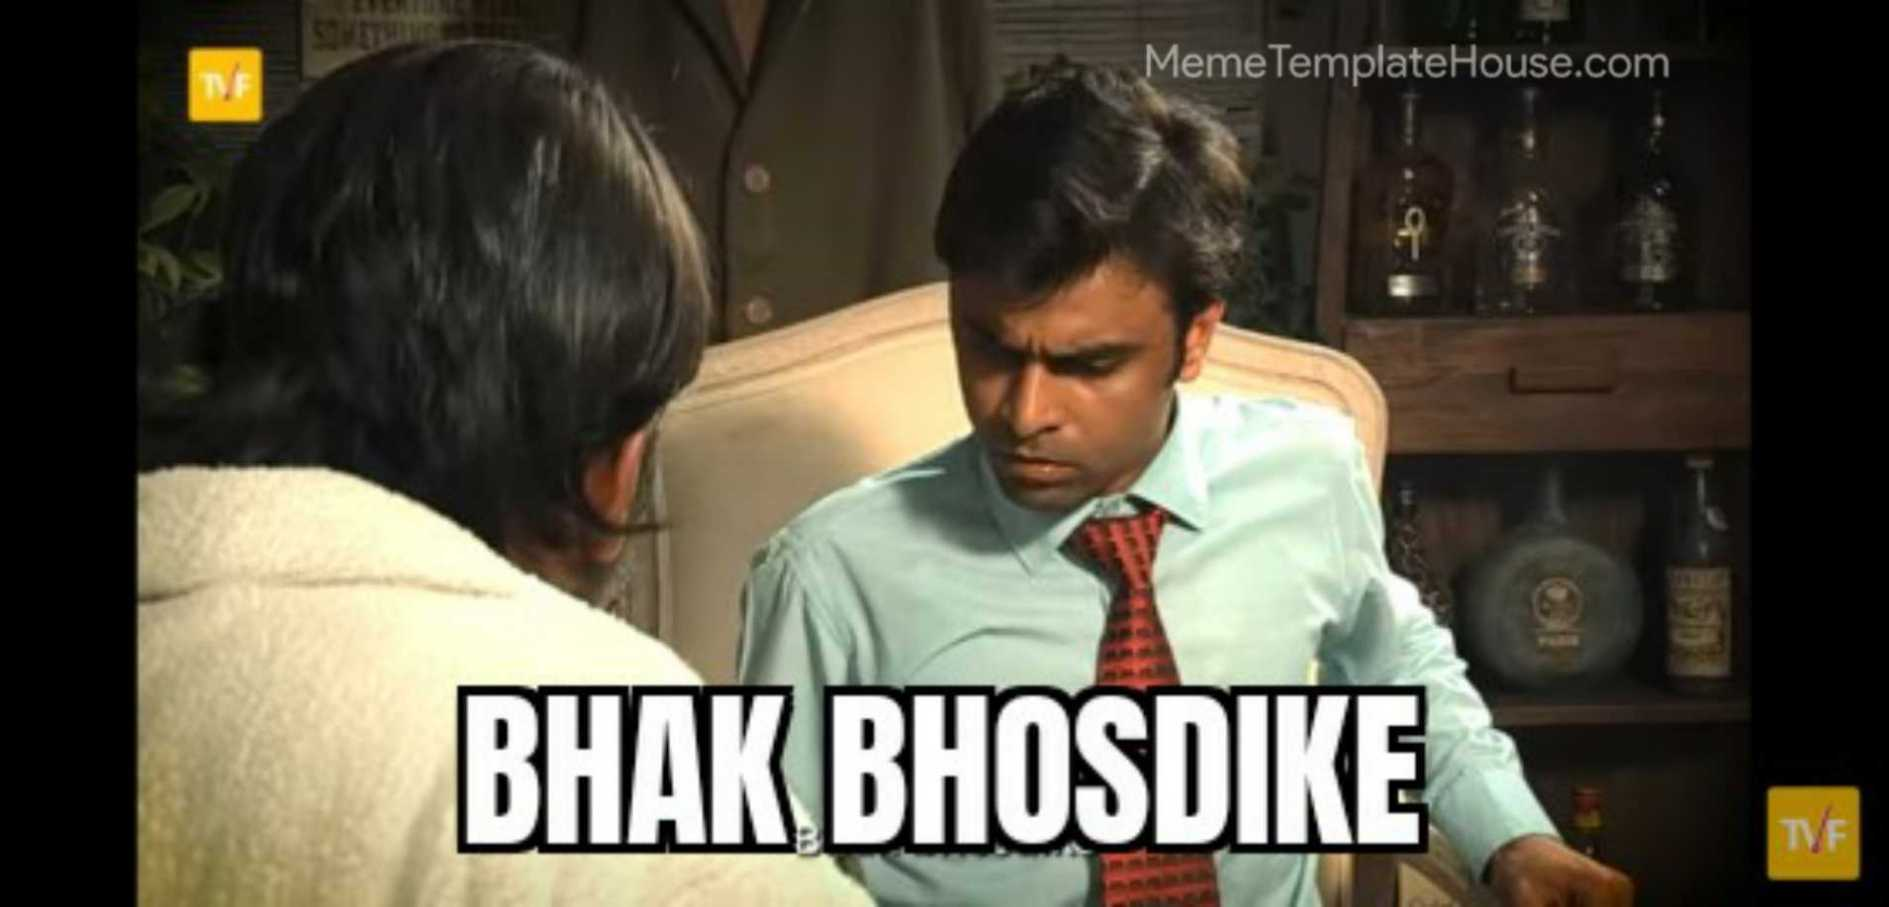 Bhak bhosdike jeetu bhaiya tvf meme template